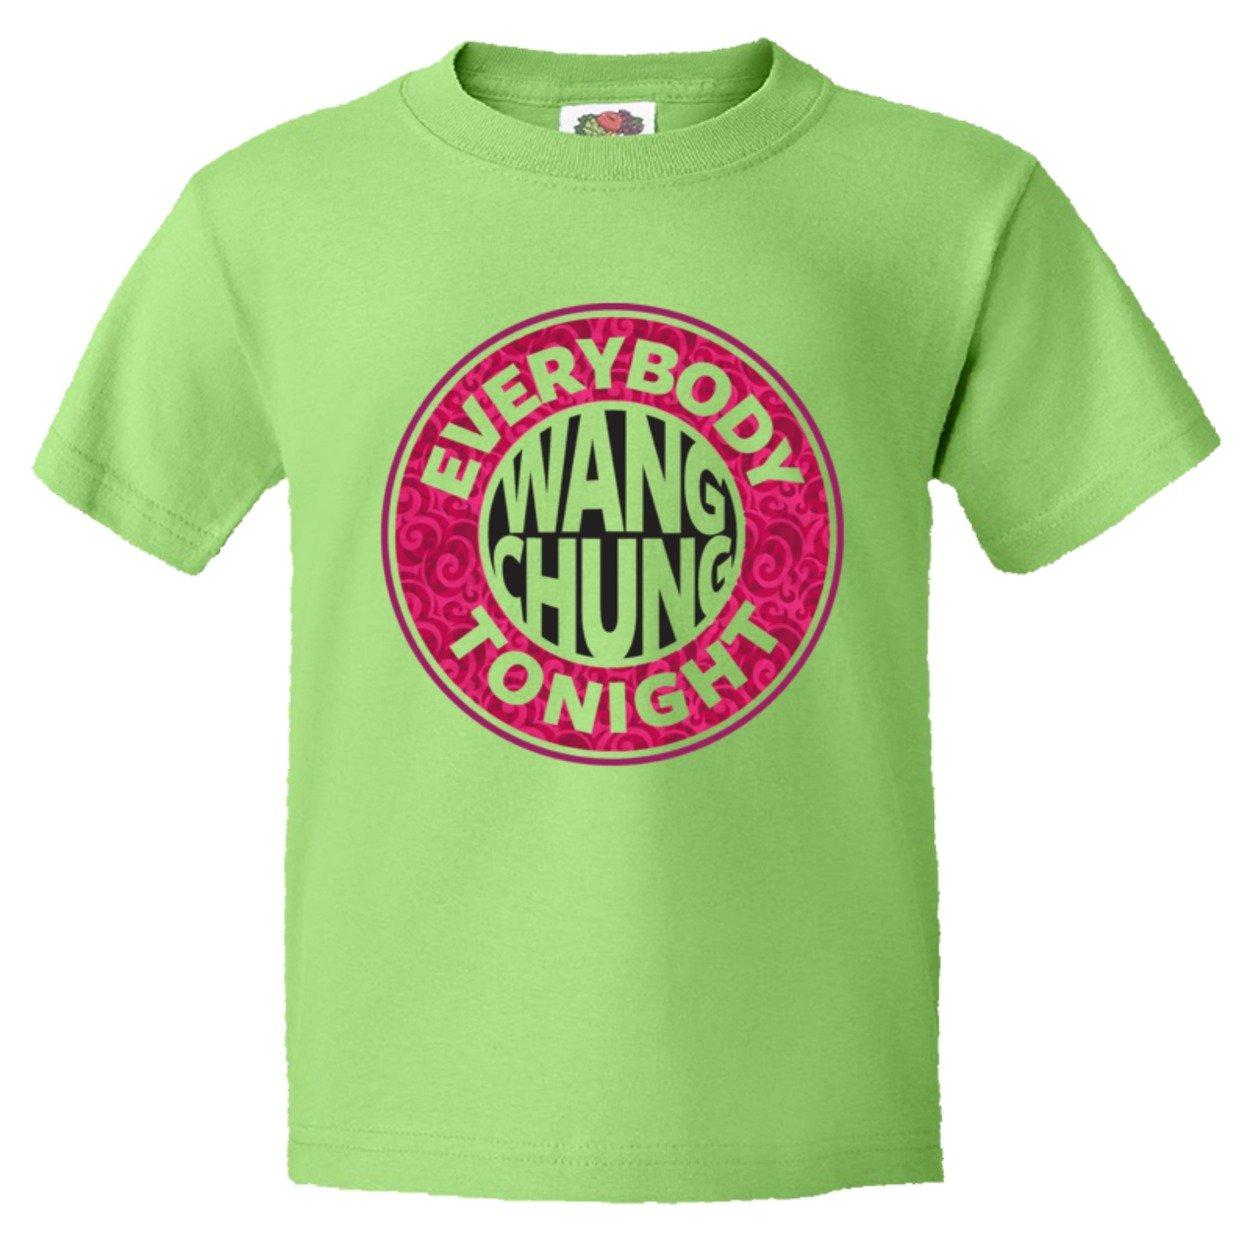 Youth Wang Everybody Chung Have Fun Tonight HQ Tee Shirt